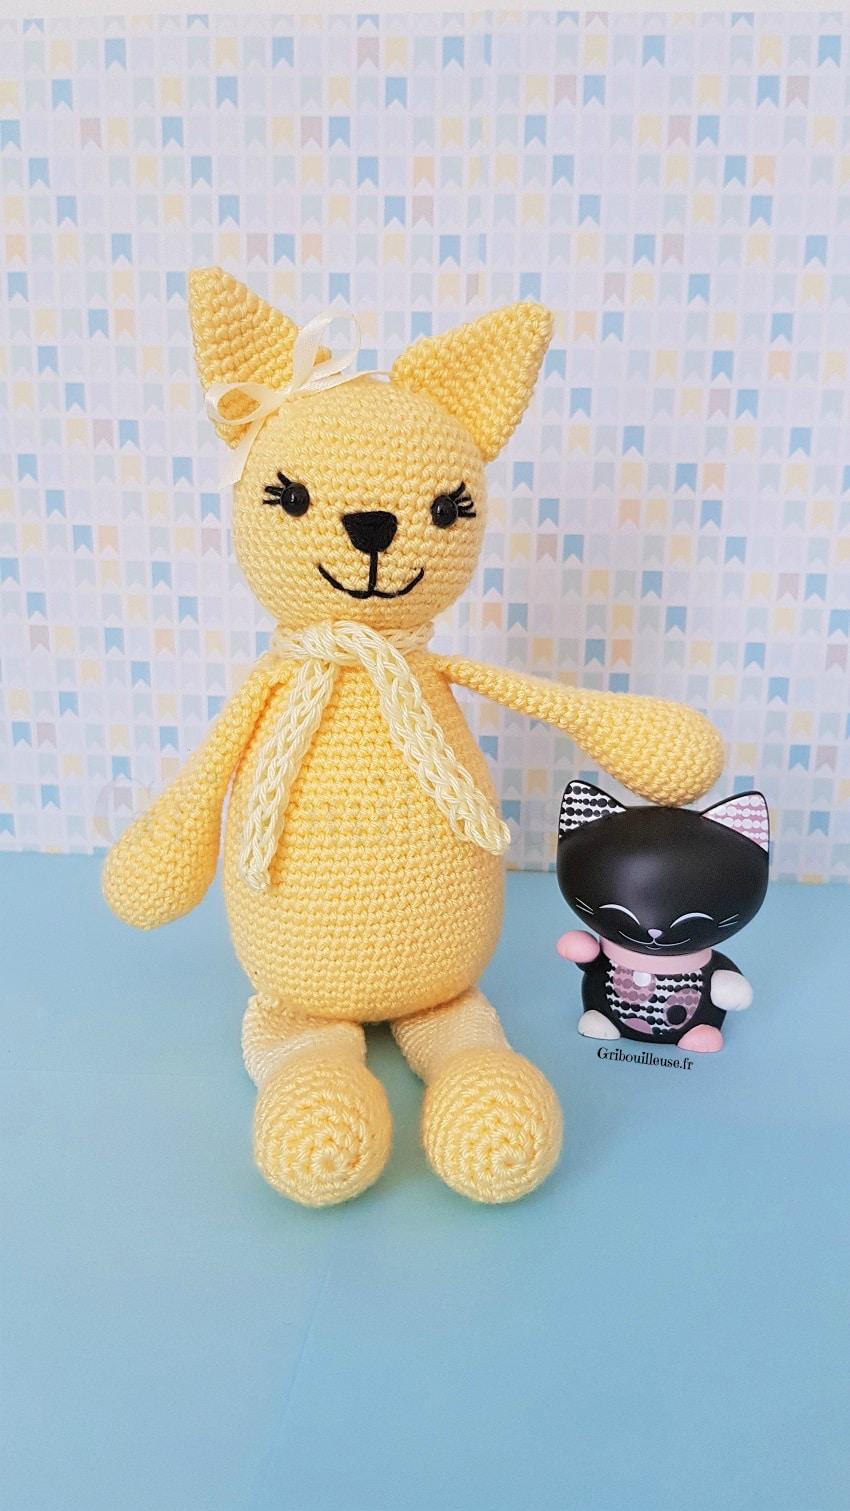 Amigurumi - Chat au crochet